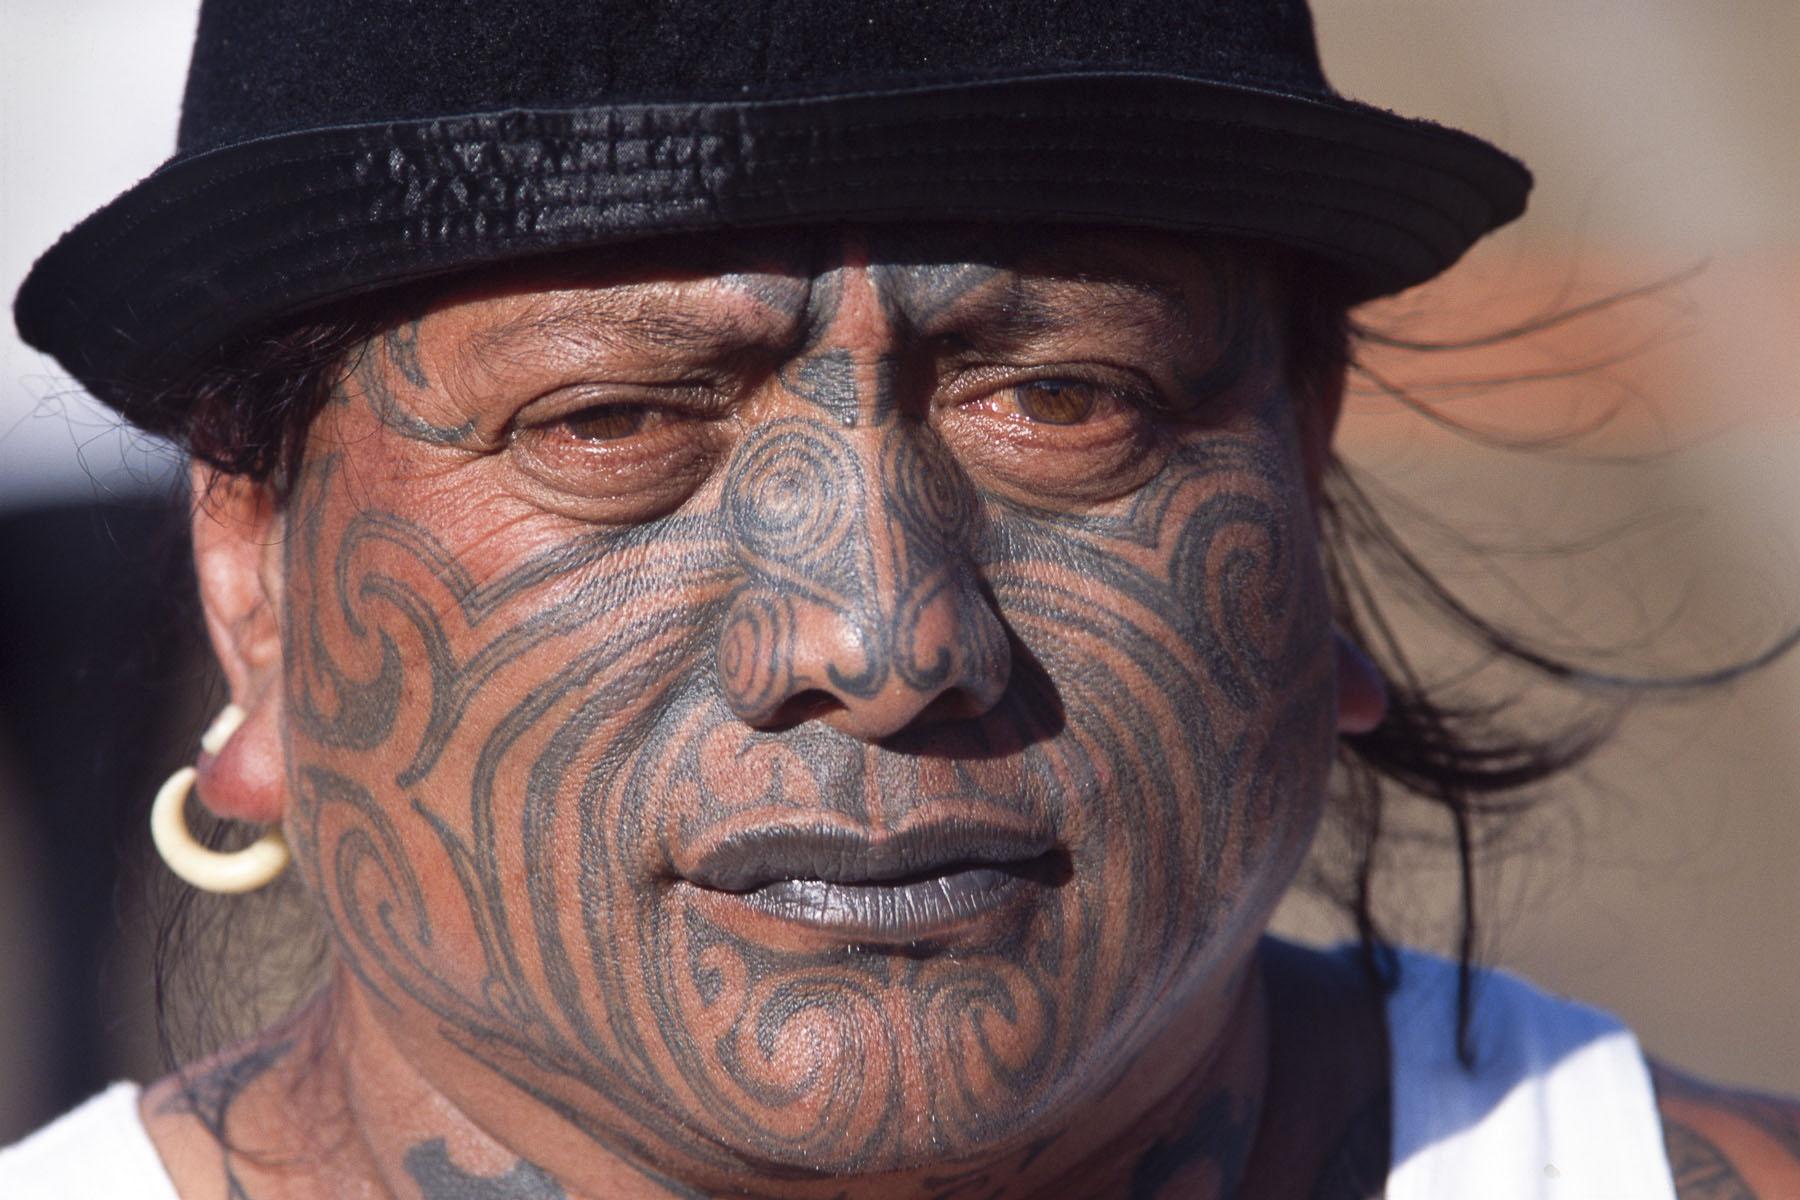 Tame Iti, a radical Maori activist shows his real moko, a full facial traditional tattoo during a Maori culture folk arts festival in May 2000